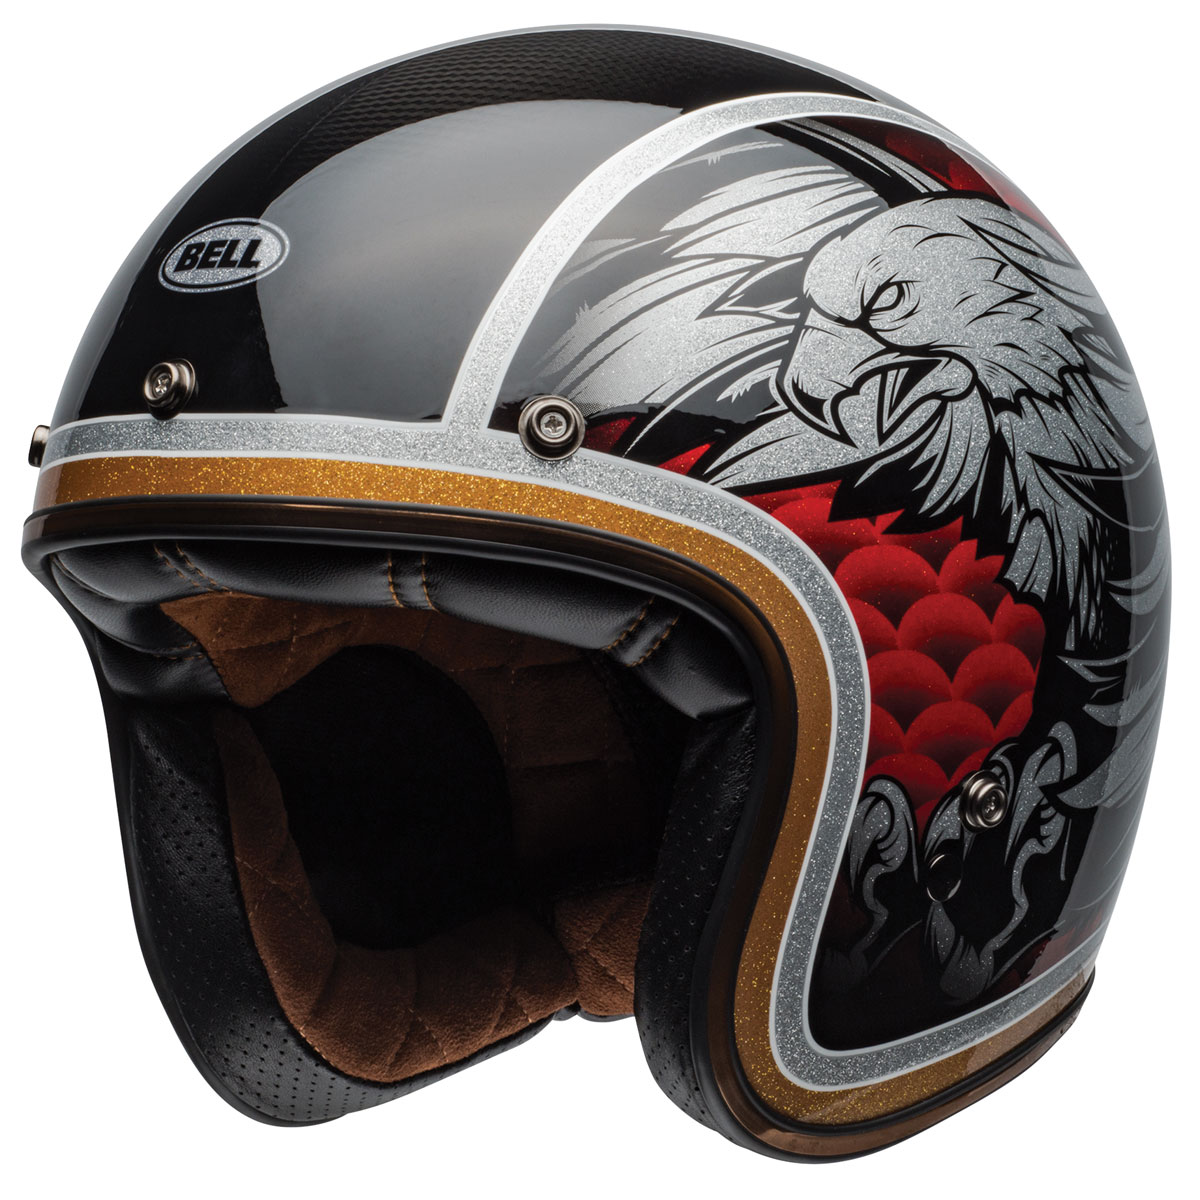 Bell Custom 500 Carbon Osprey Open Face Helmet